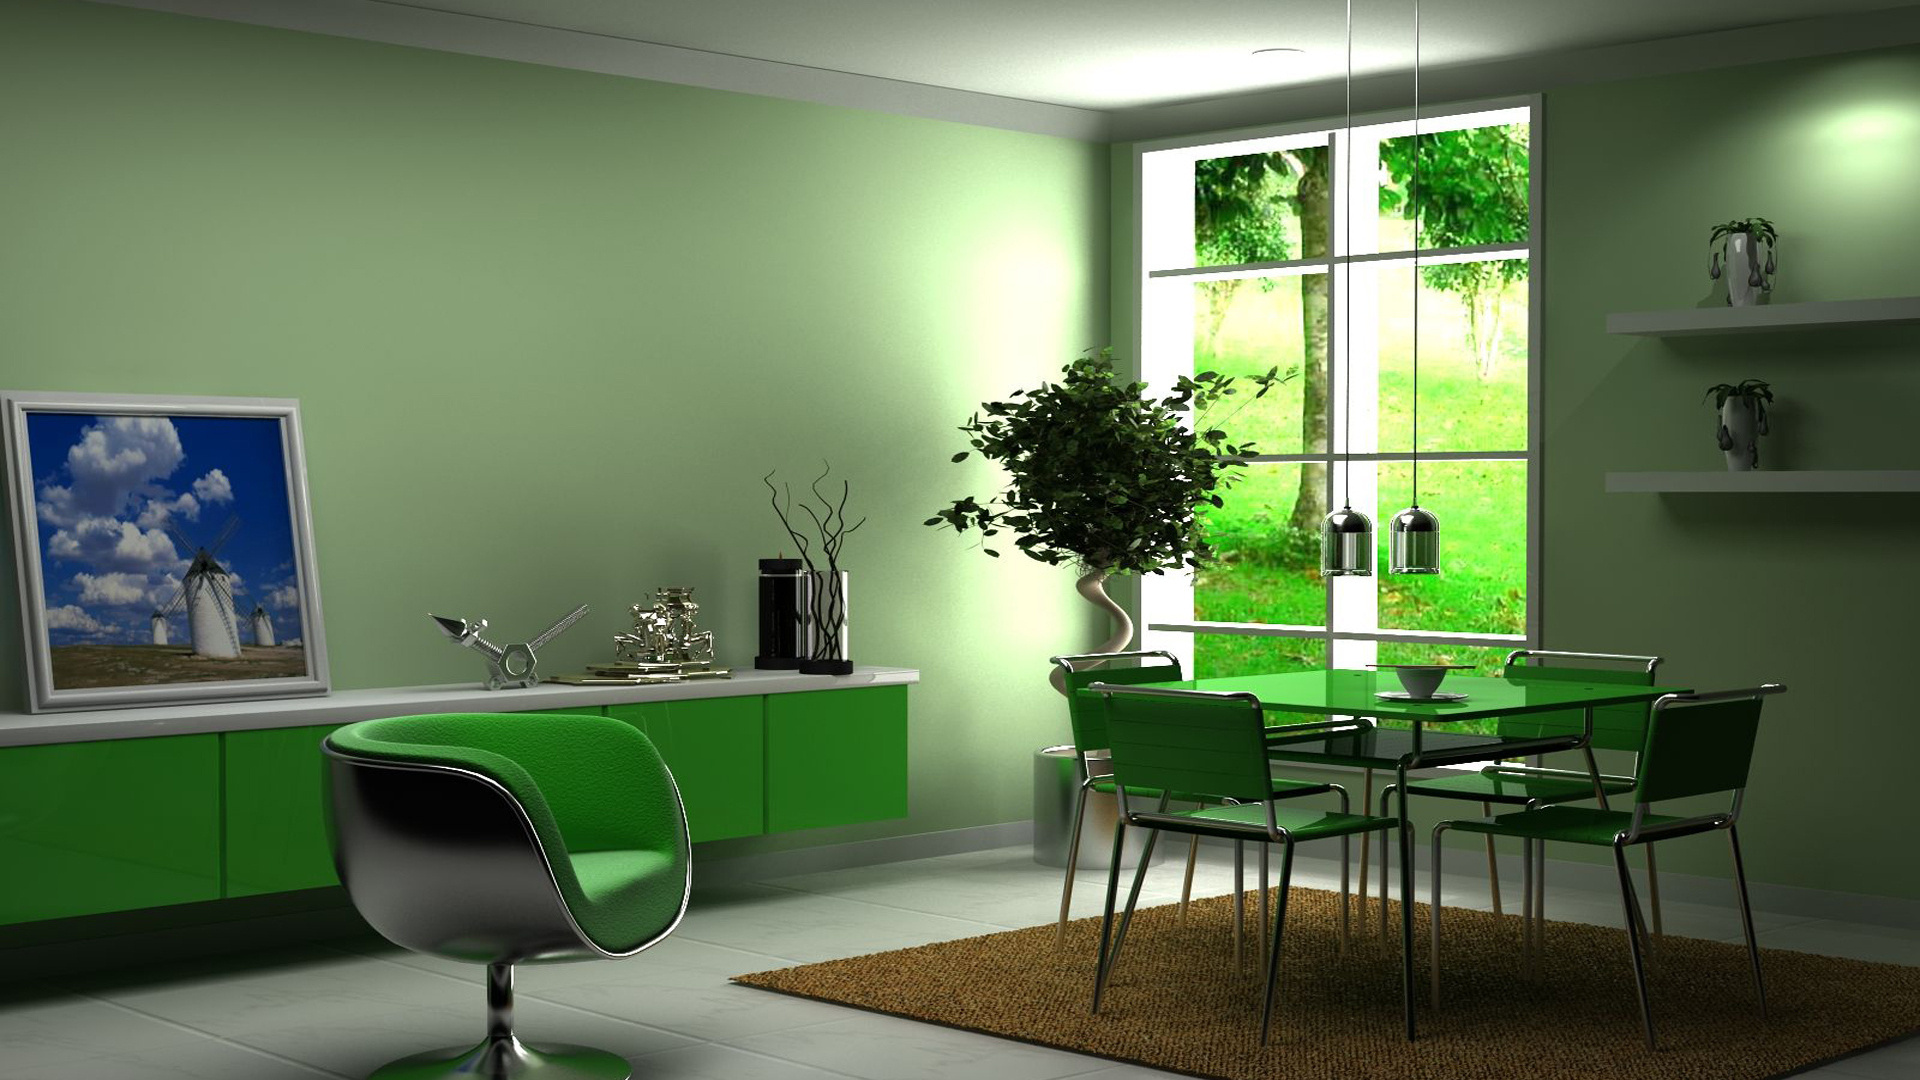 Home interior design photos hd - Best Home Interior Design Hd Images Home Interior Design Home Interior Wallpapers Wallpapersafari